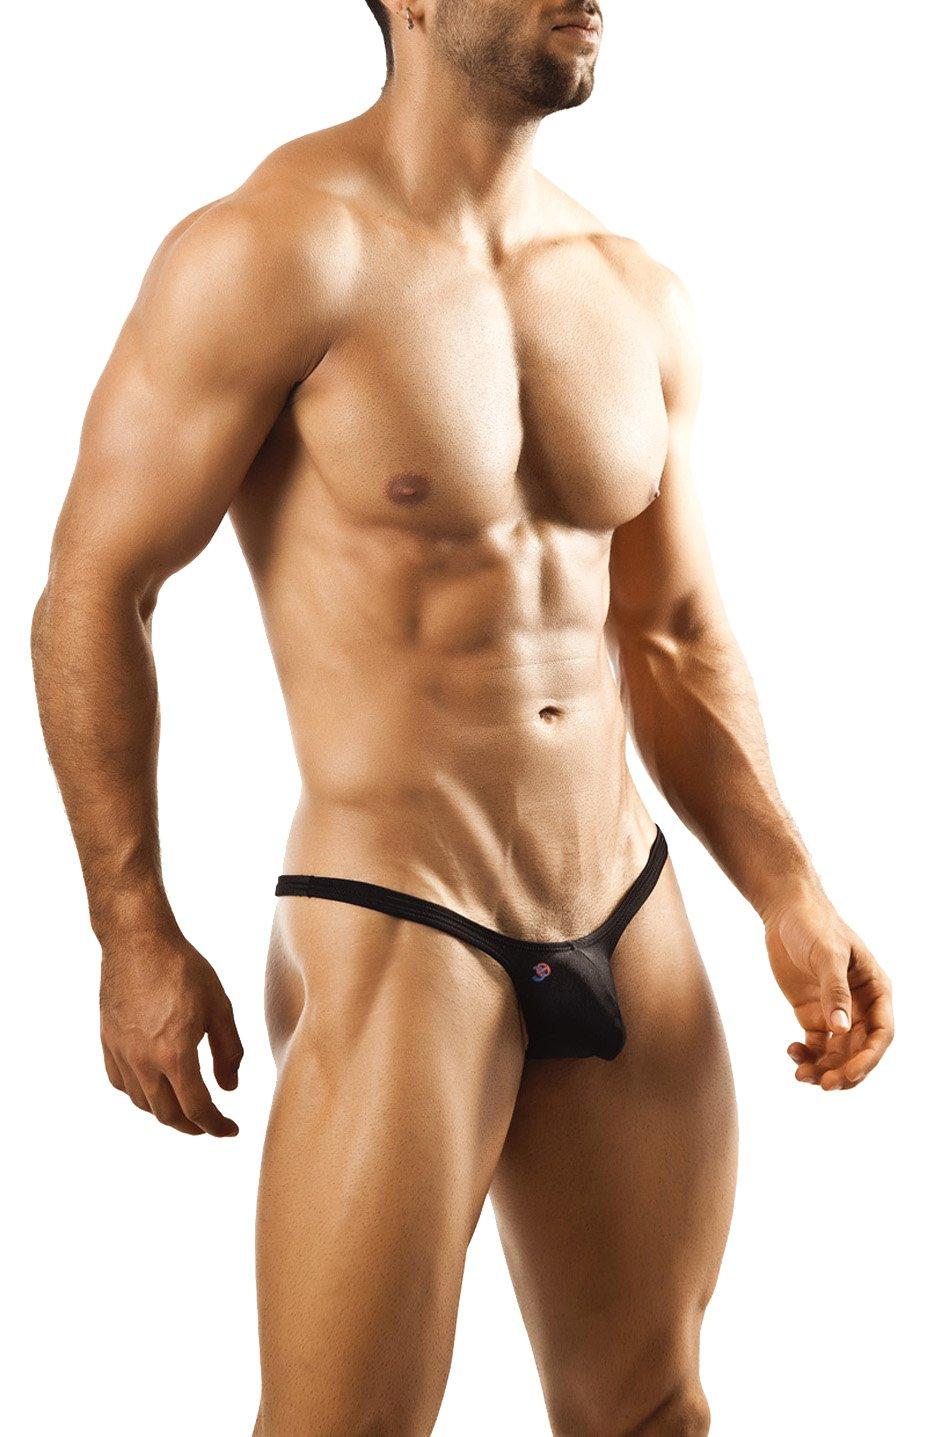 JOE SNYDER Bulge Thong 02 JSBUL02-Black